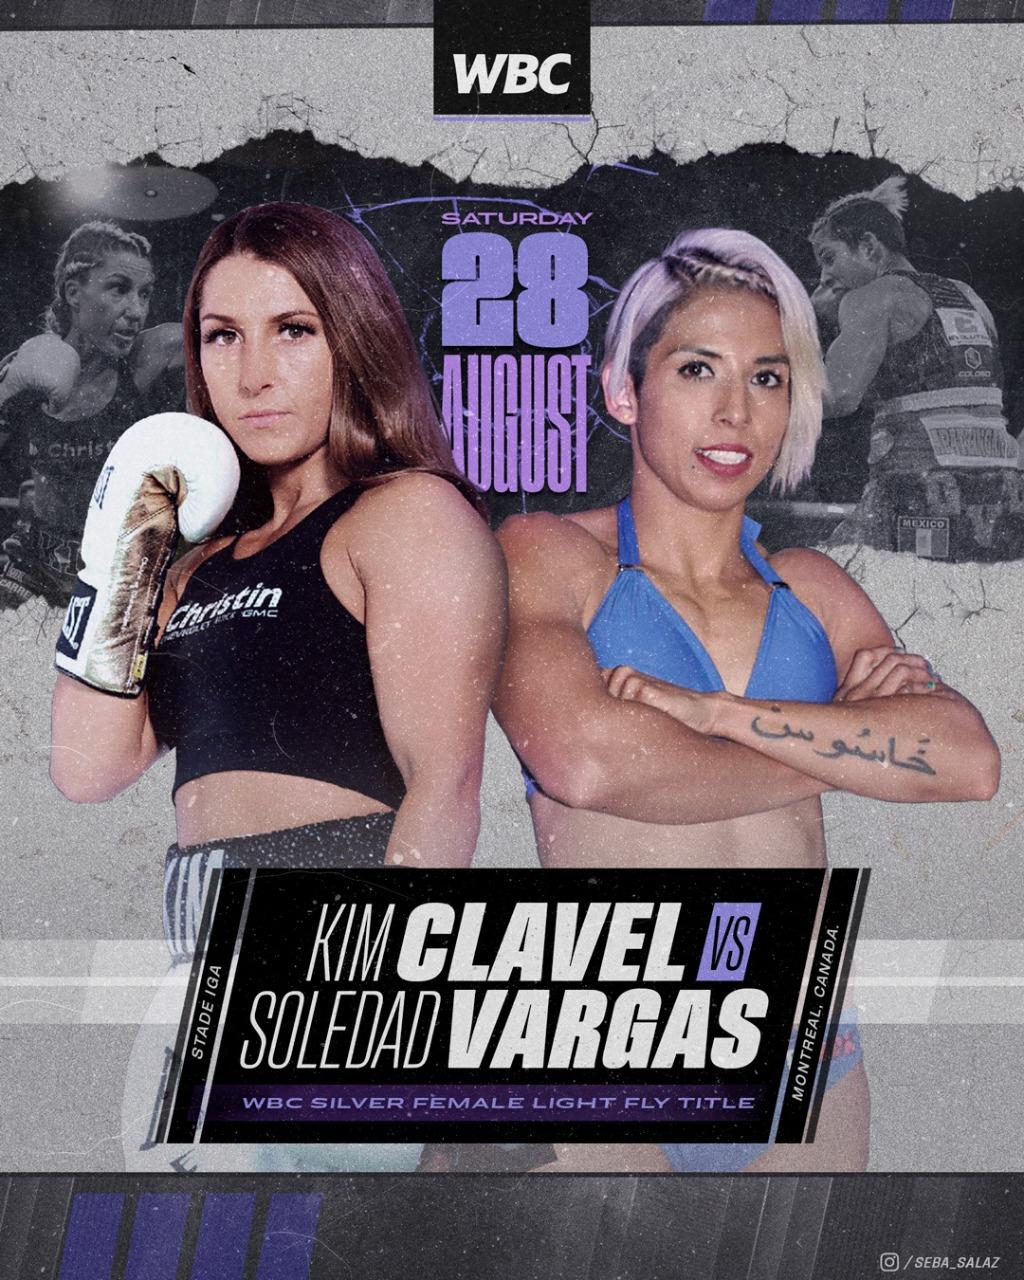 https://suljosblog.com/suljos/wp-content/uploads/2021/08/CLAVEL-VARGAS-WBC-ART.jpg